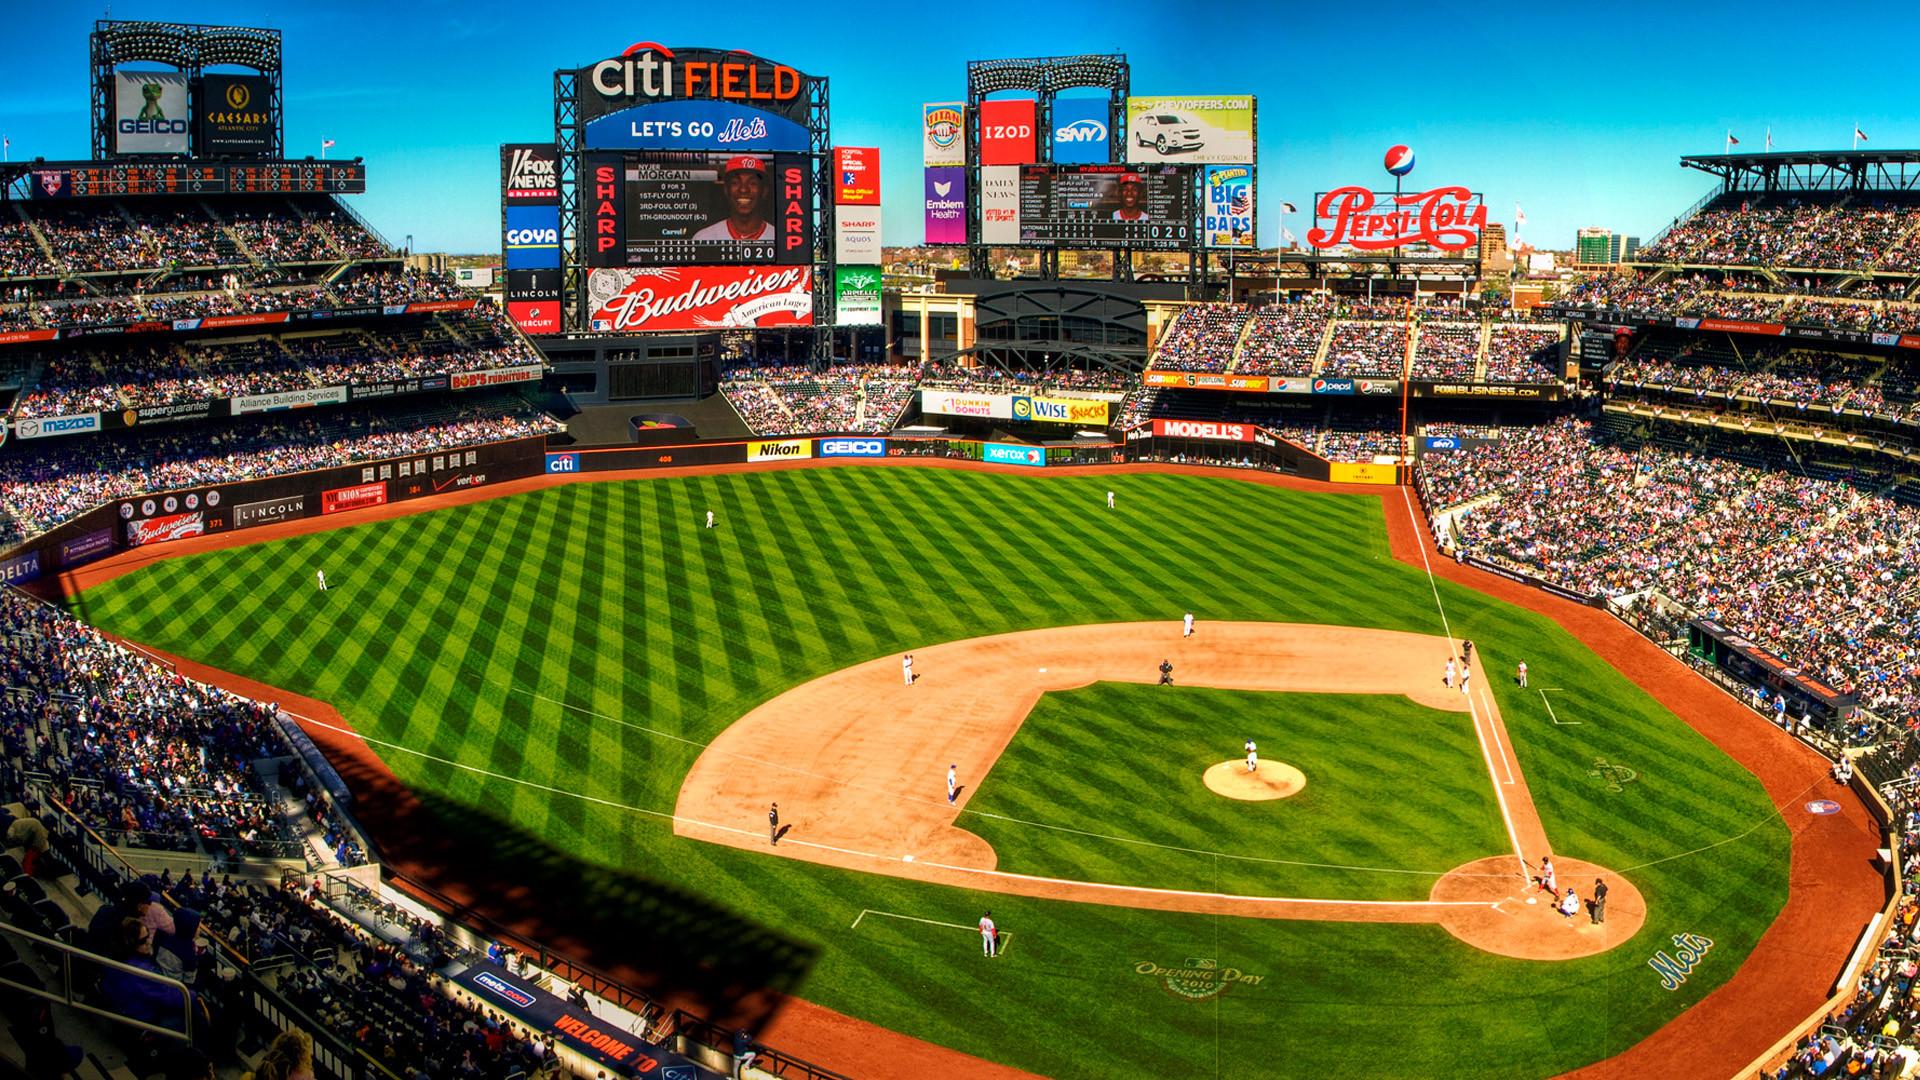 New York Mets wallpapers   New York Mets background